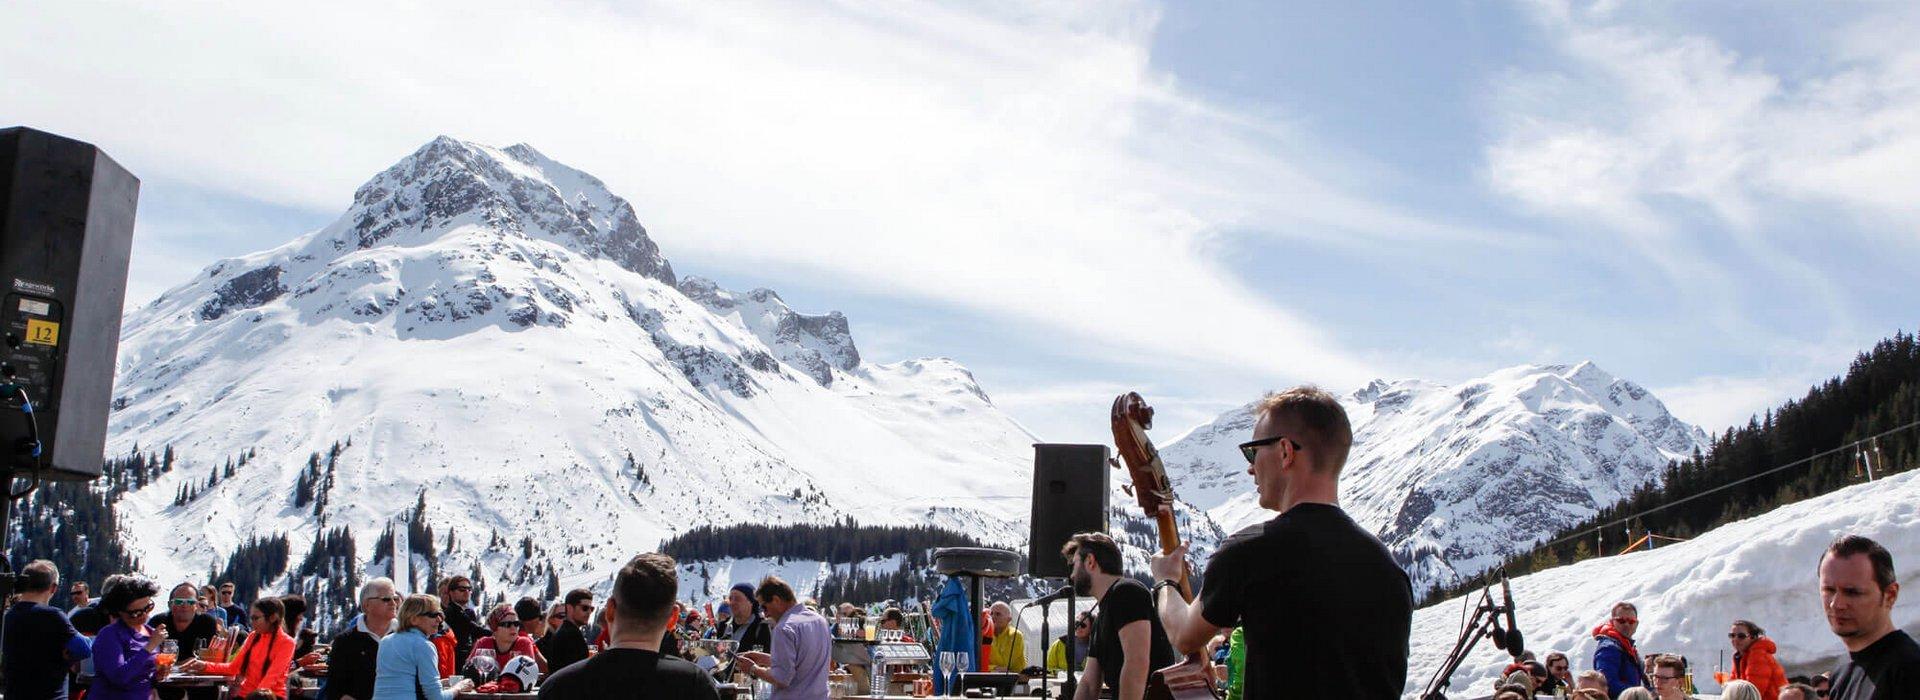 Live-Musik vor Gipfelpanorama